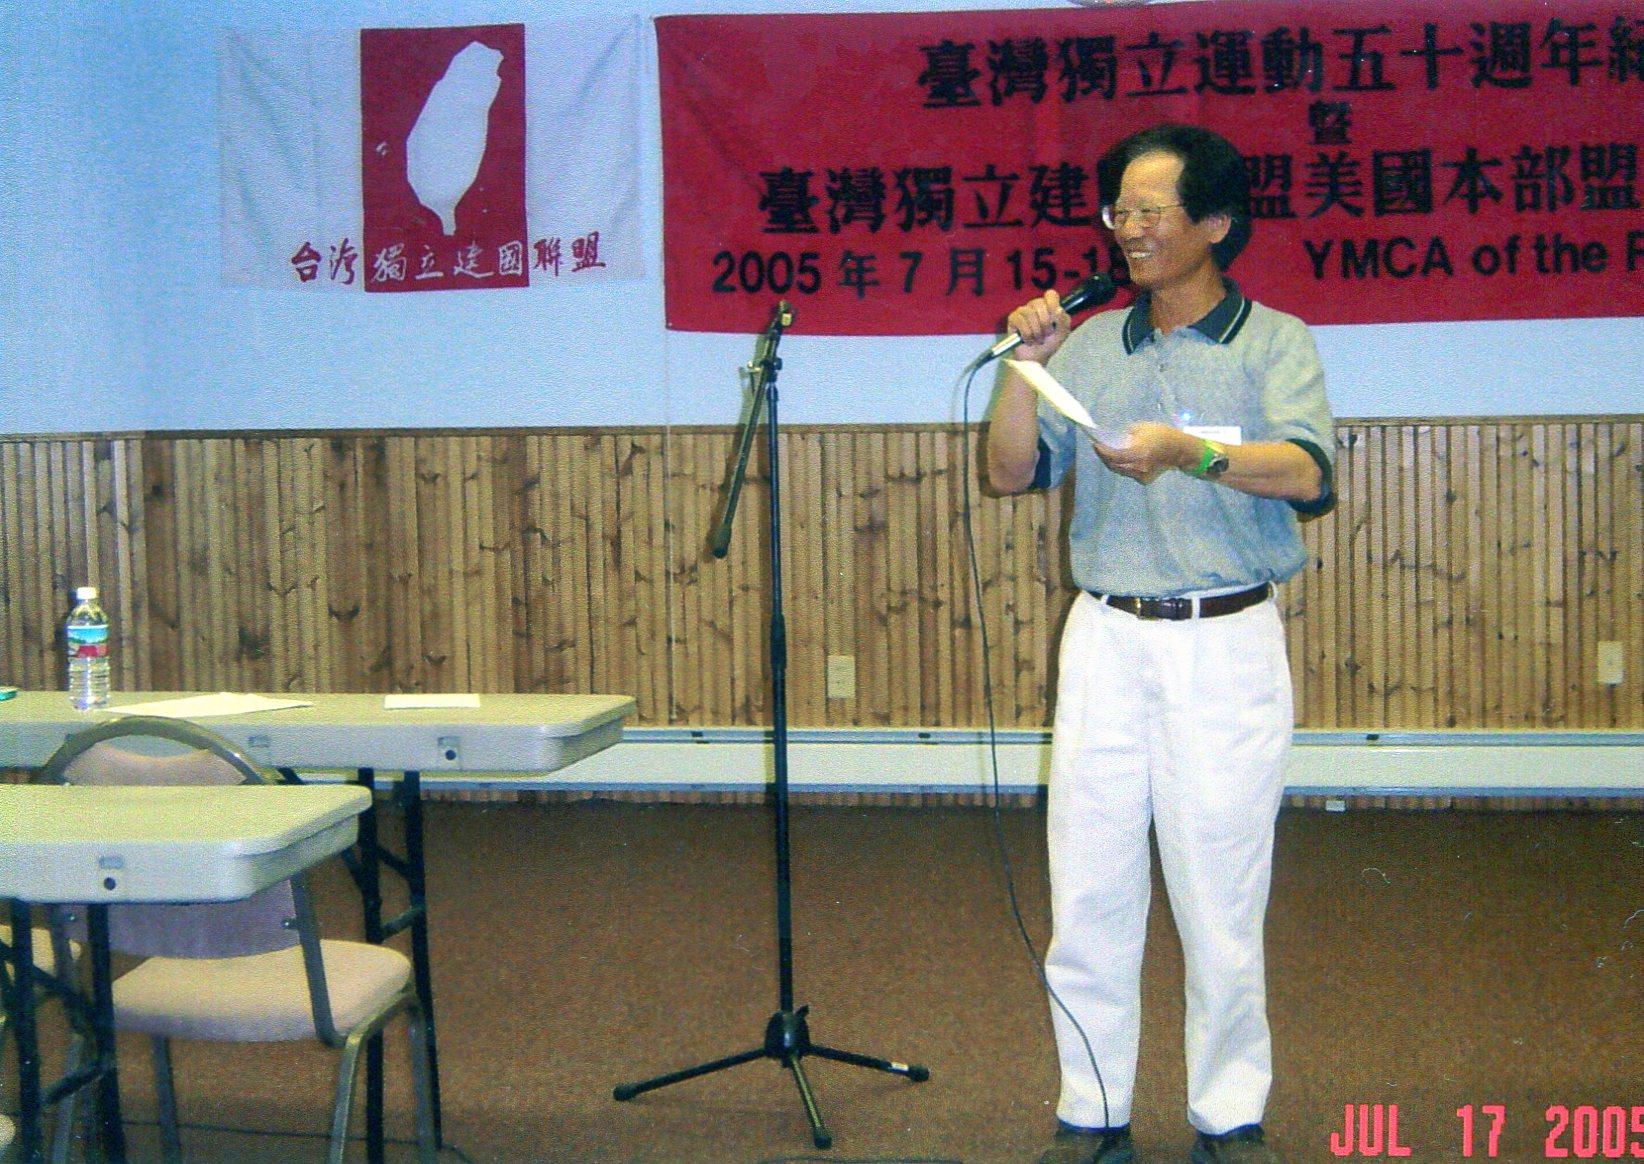 5. Collection of Mr. Yung Hwa Hsu 許永華先生的收藏